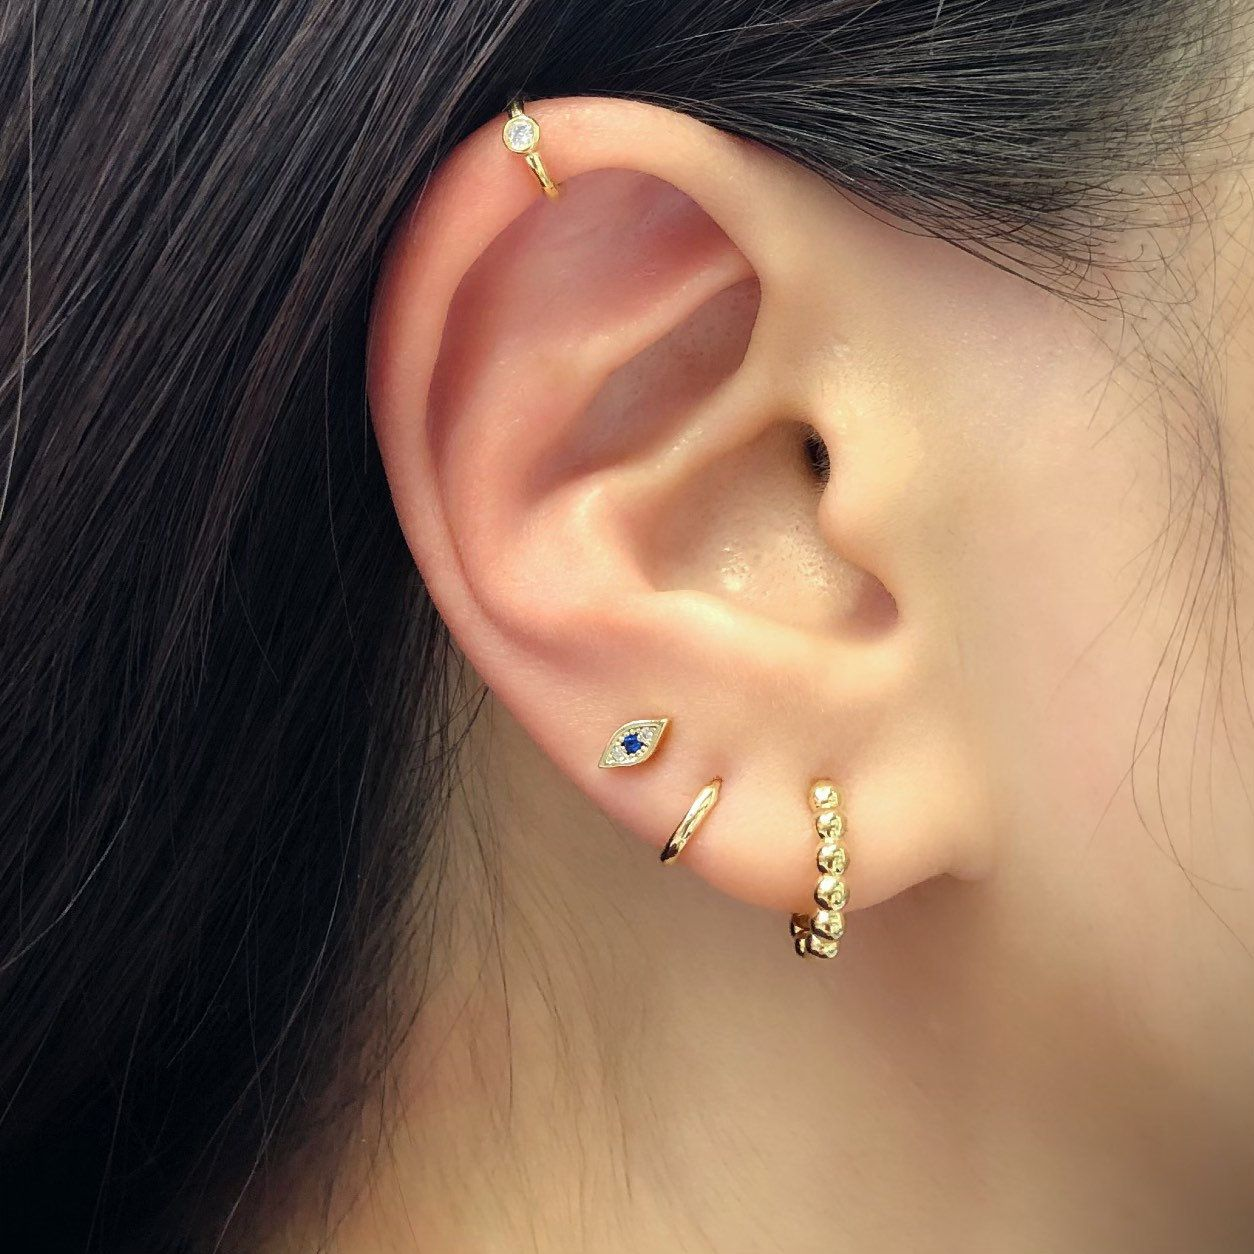 Diamond Studs Gift for Her Minimalist Earrings Minimalist Studs 14k Flat Diamond Shaped Studs 14k Gold Flat Diamond Minimalist Studs